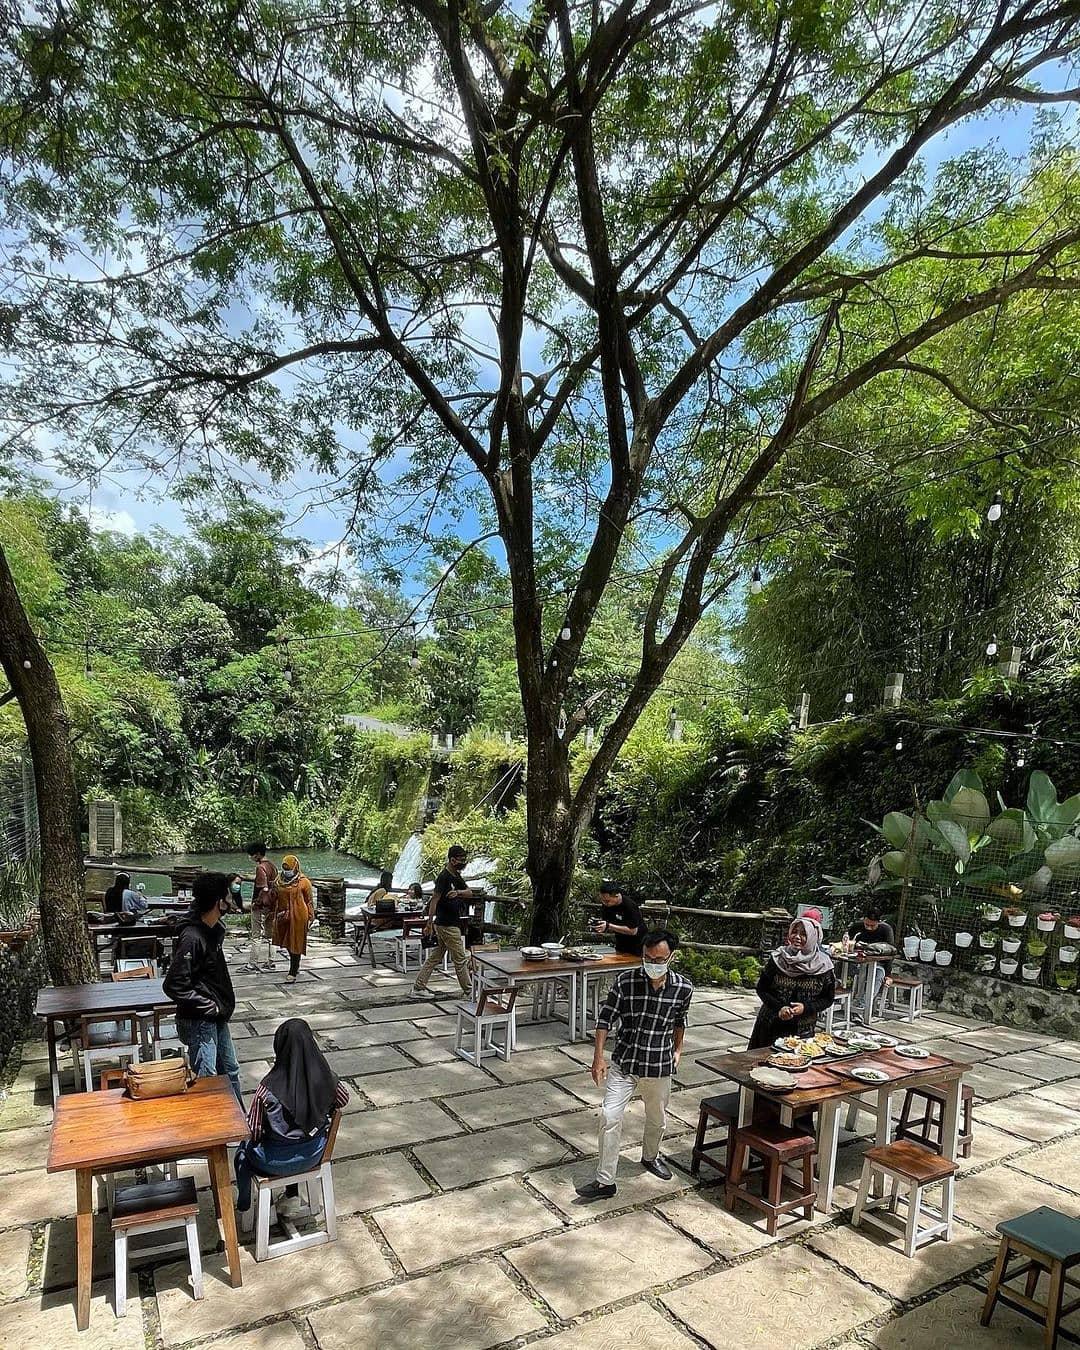 Wisata Kuliner Pinggir Sungai Sleman